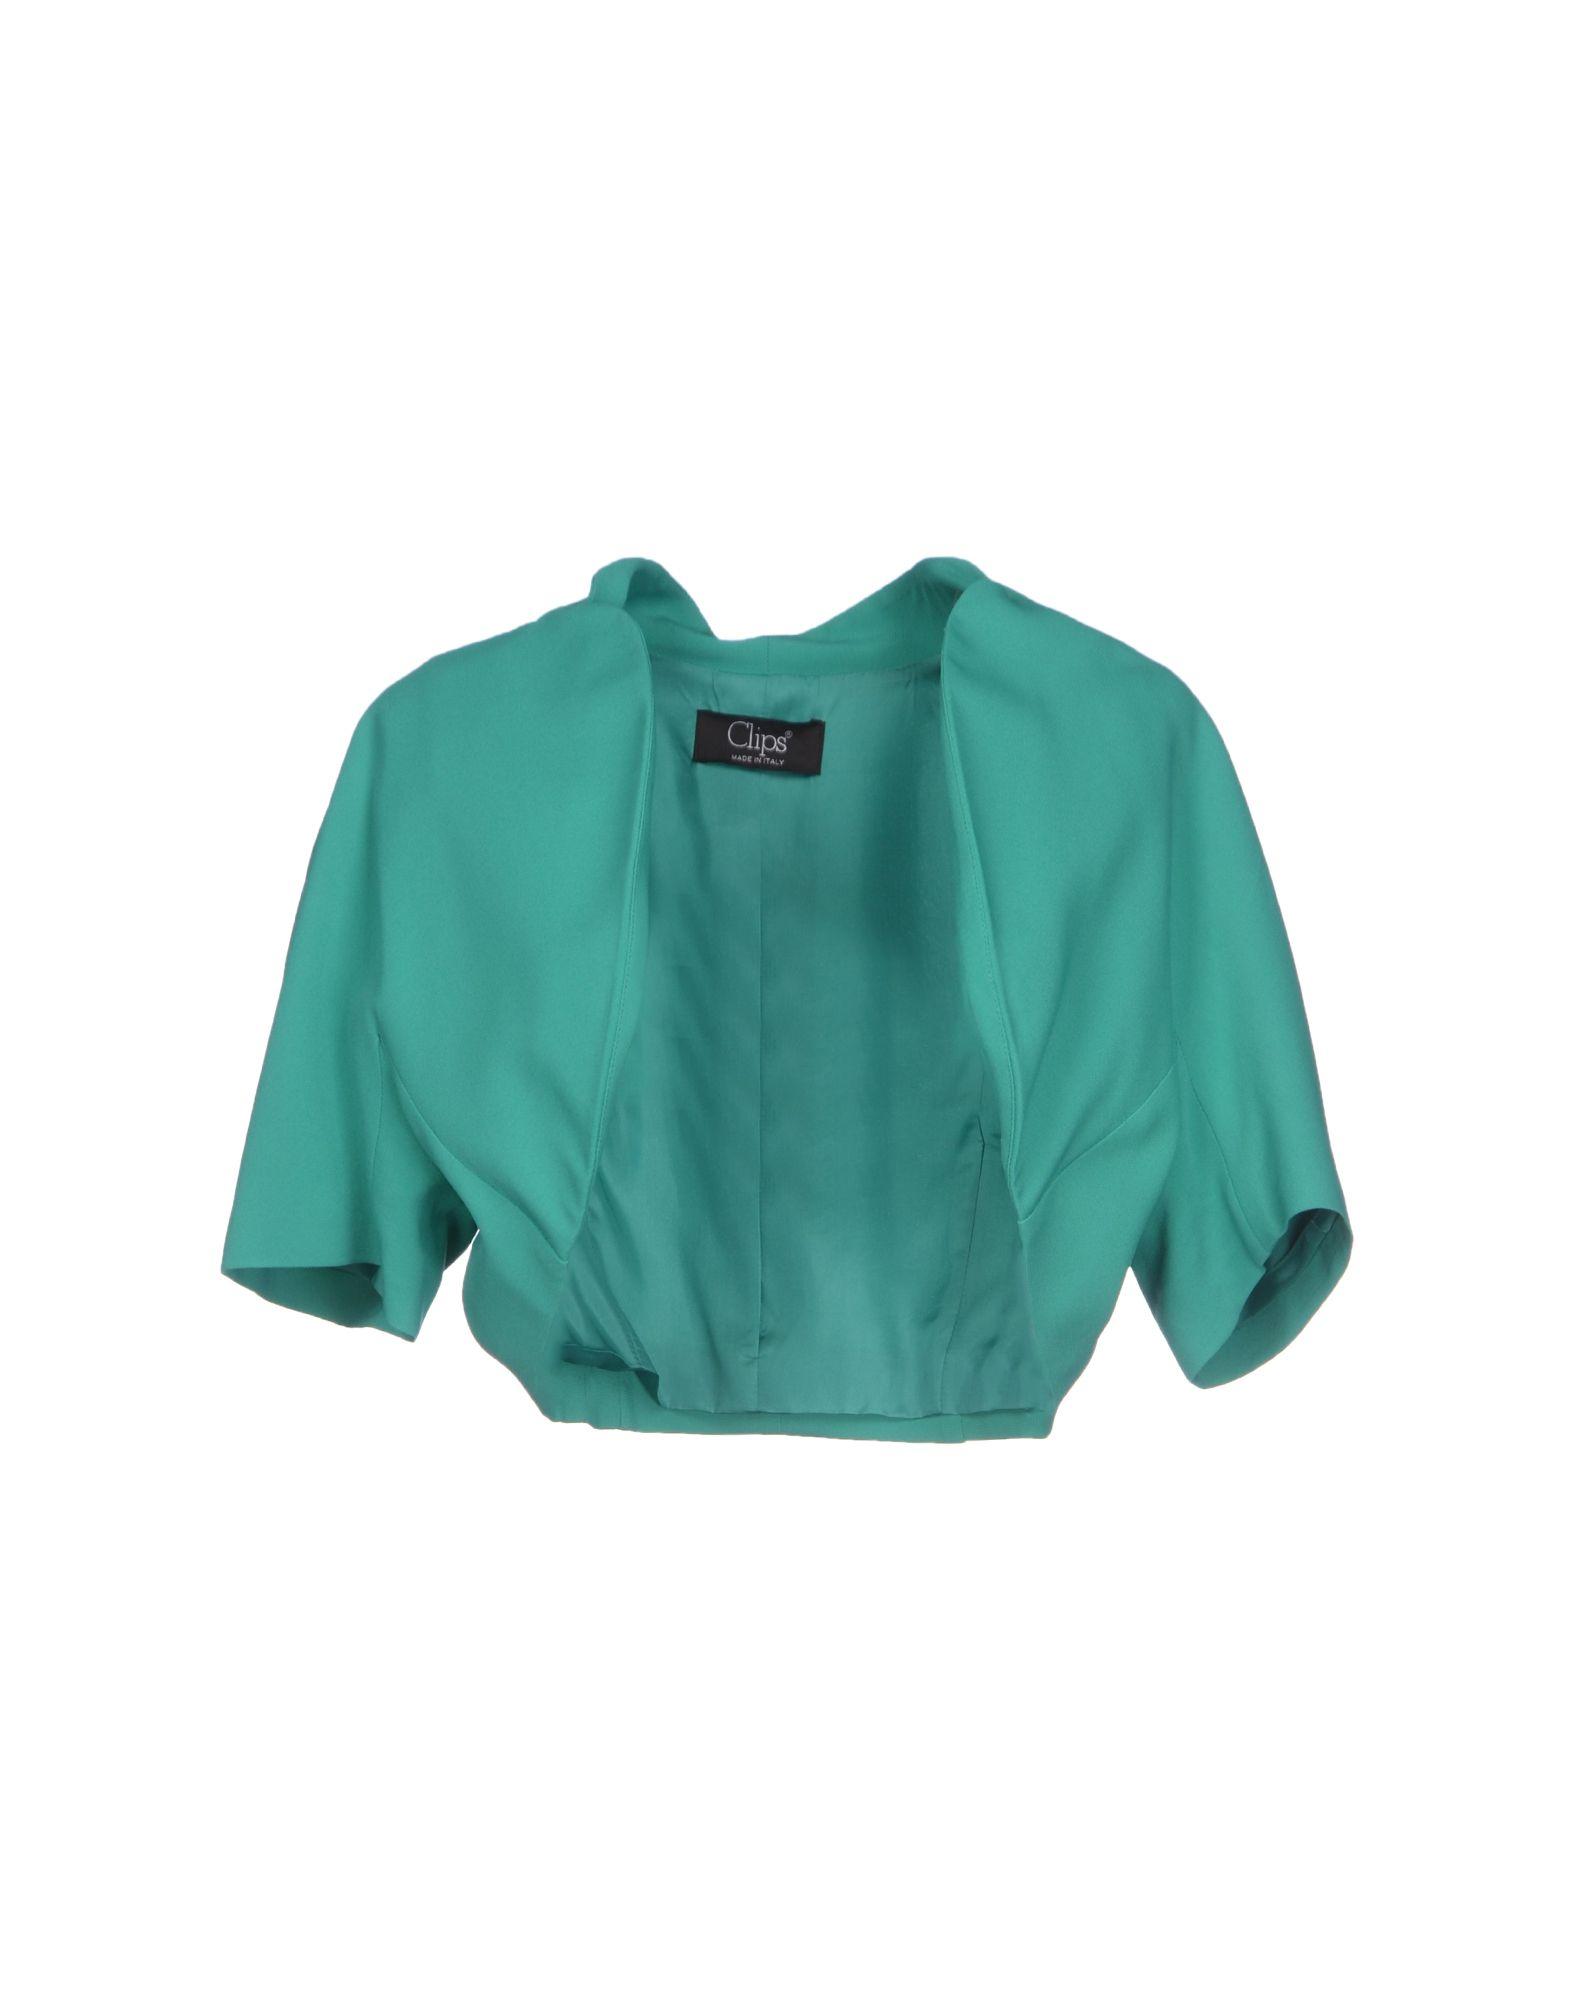 CLIPS Damen Bolero Farbe Grün Größe 7